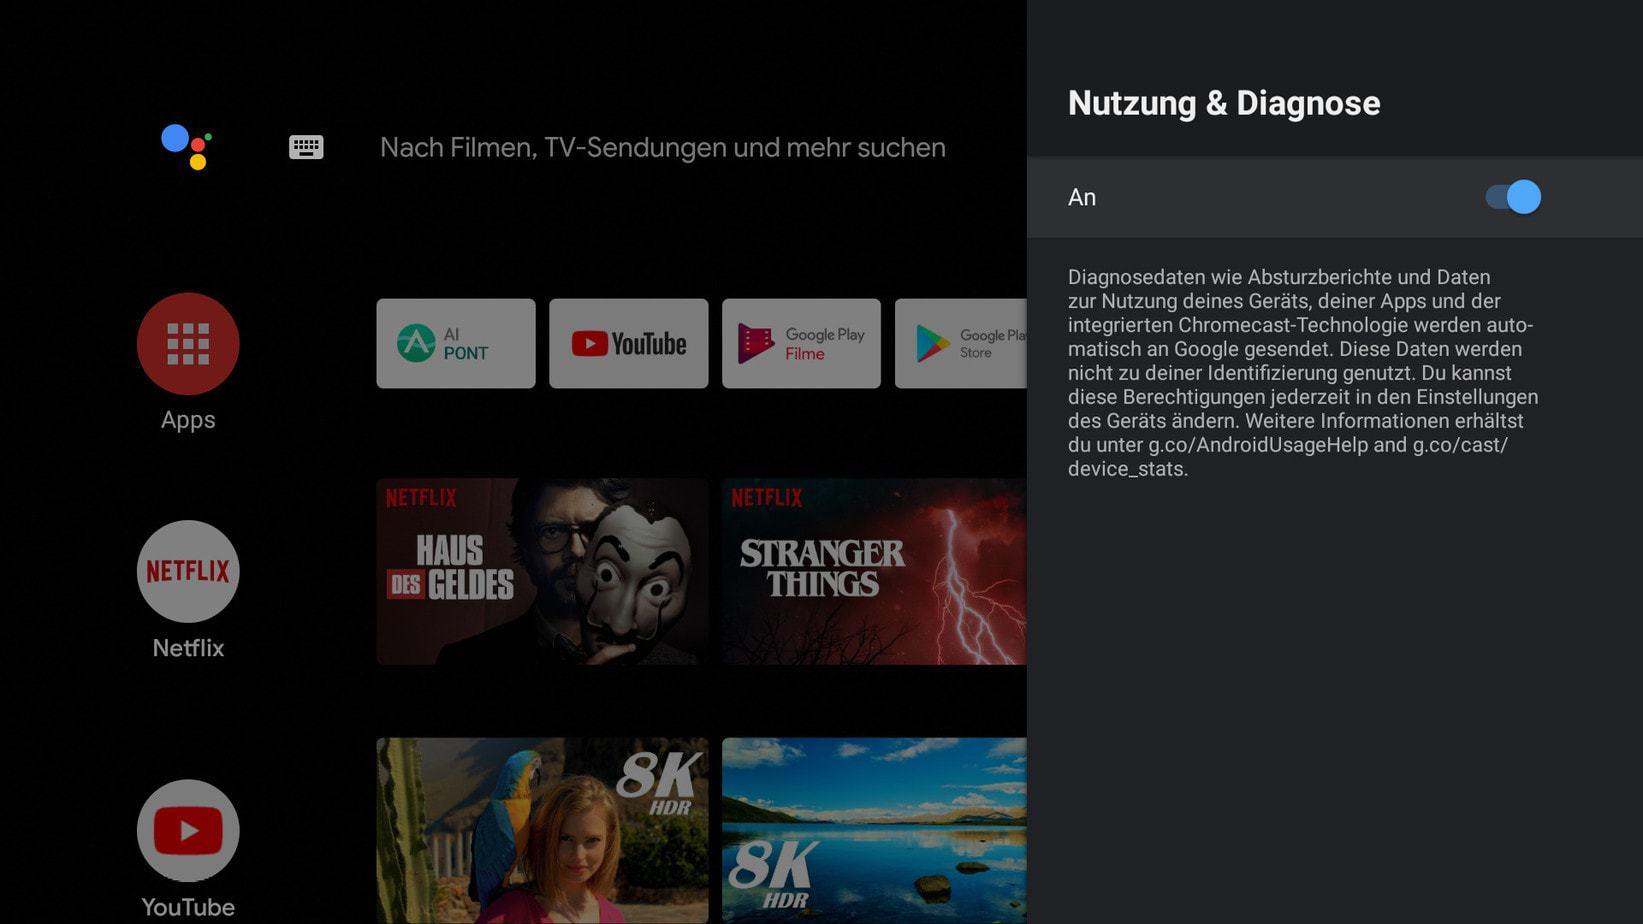 Screenshot Kagis Nutzung und DIagnose